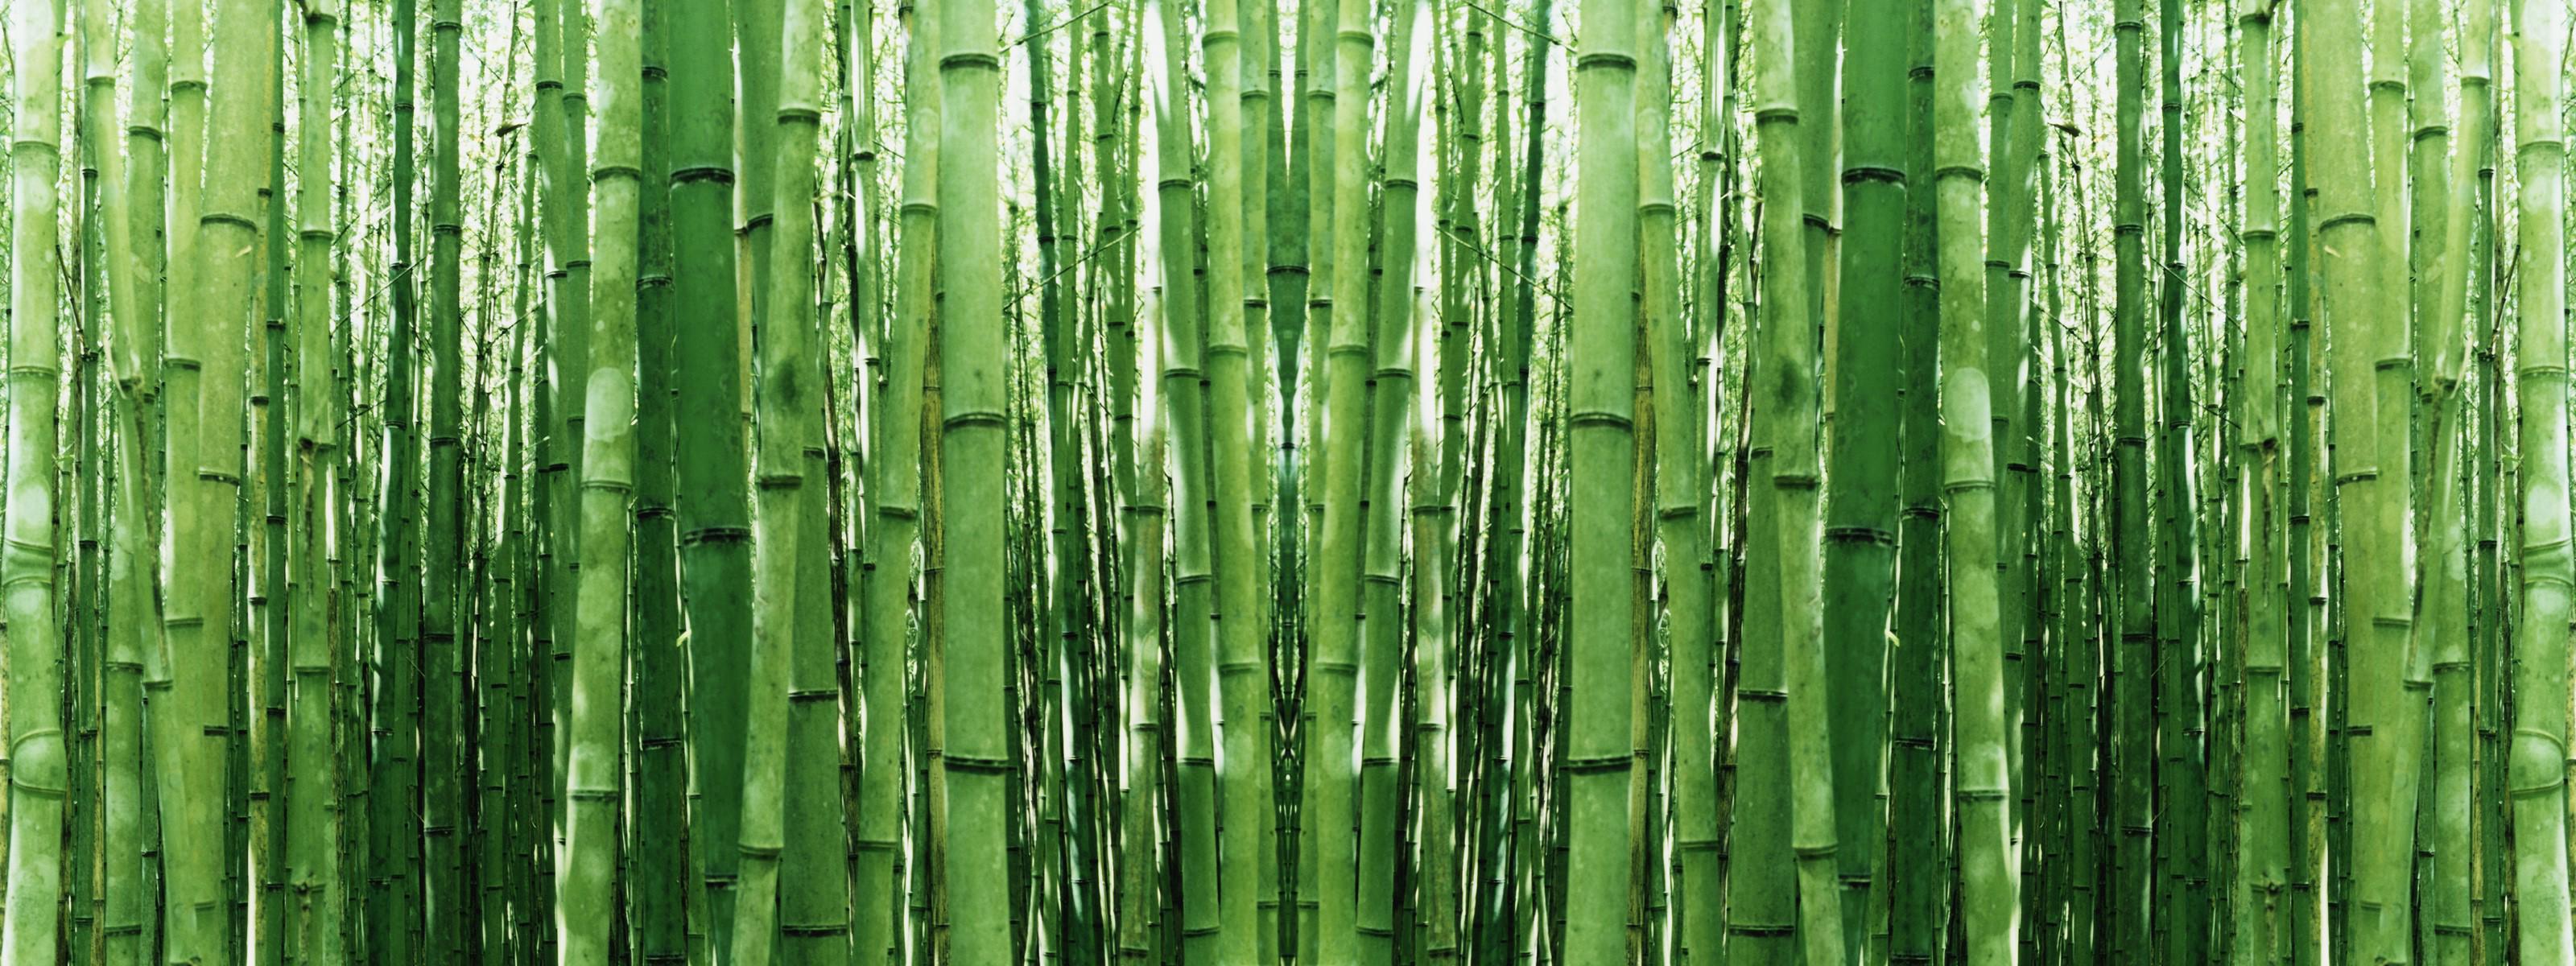 Bamboo PNG HD - 128775